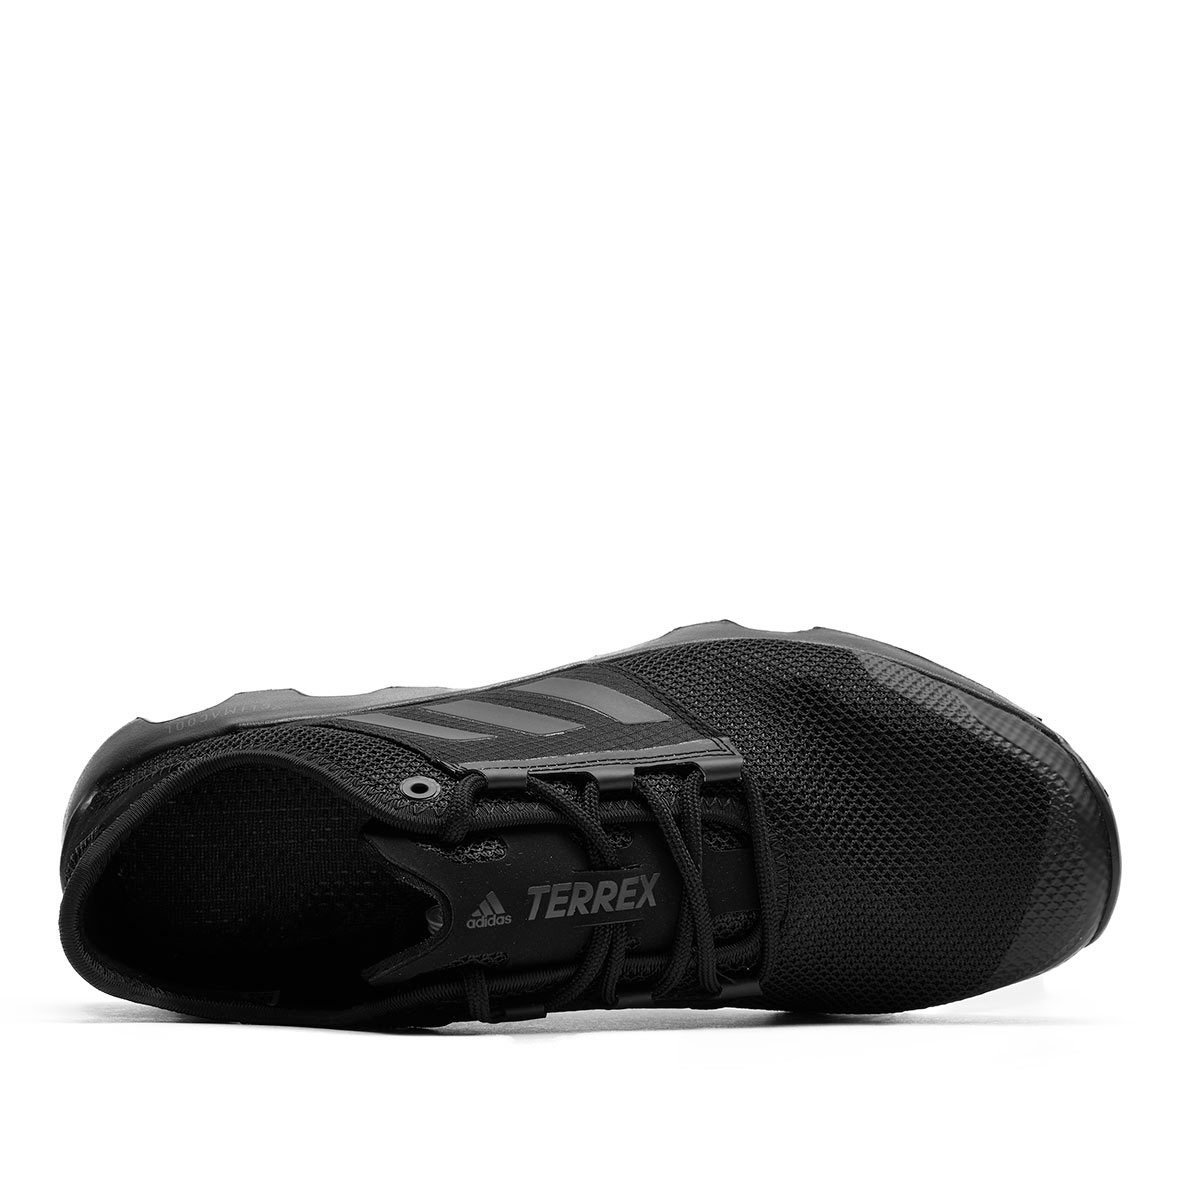 Adidas Terrex Voyager Summer Ready